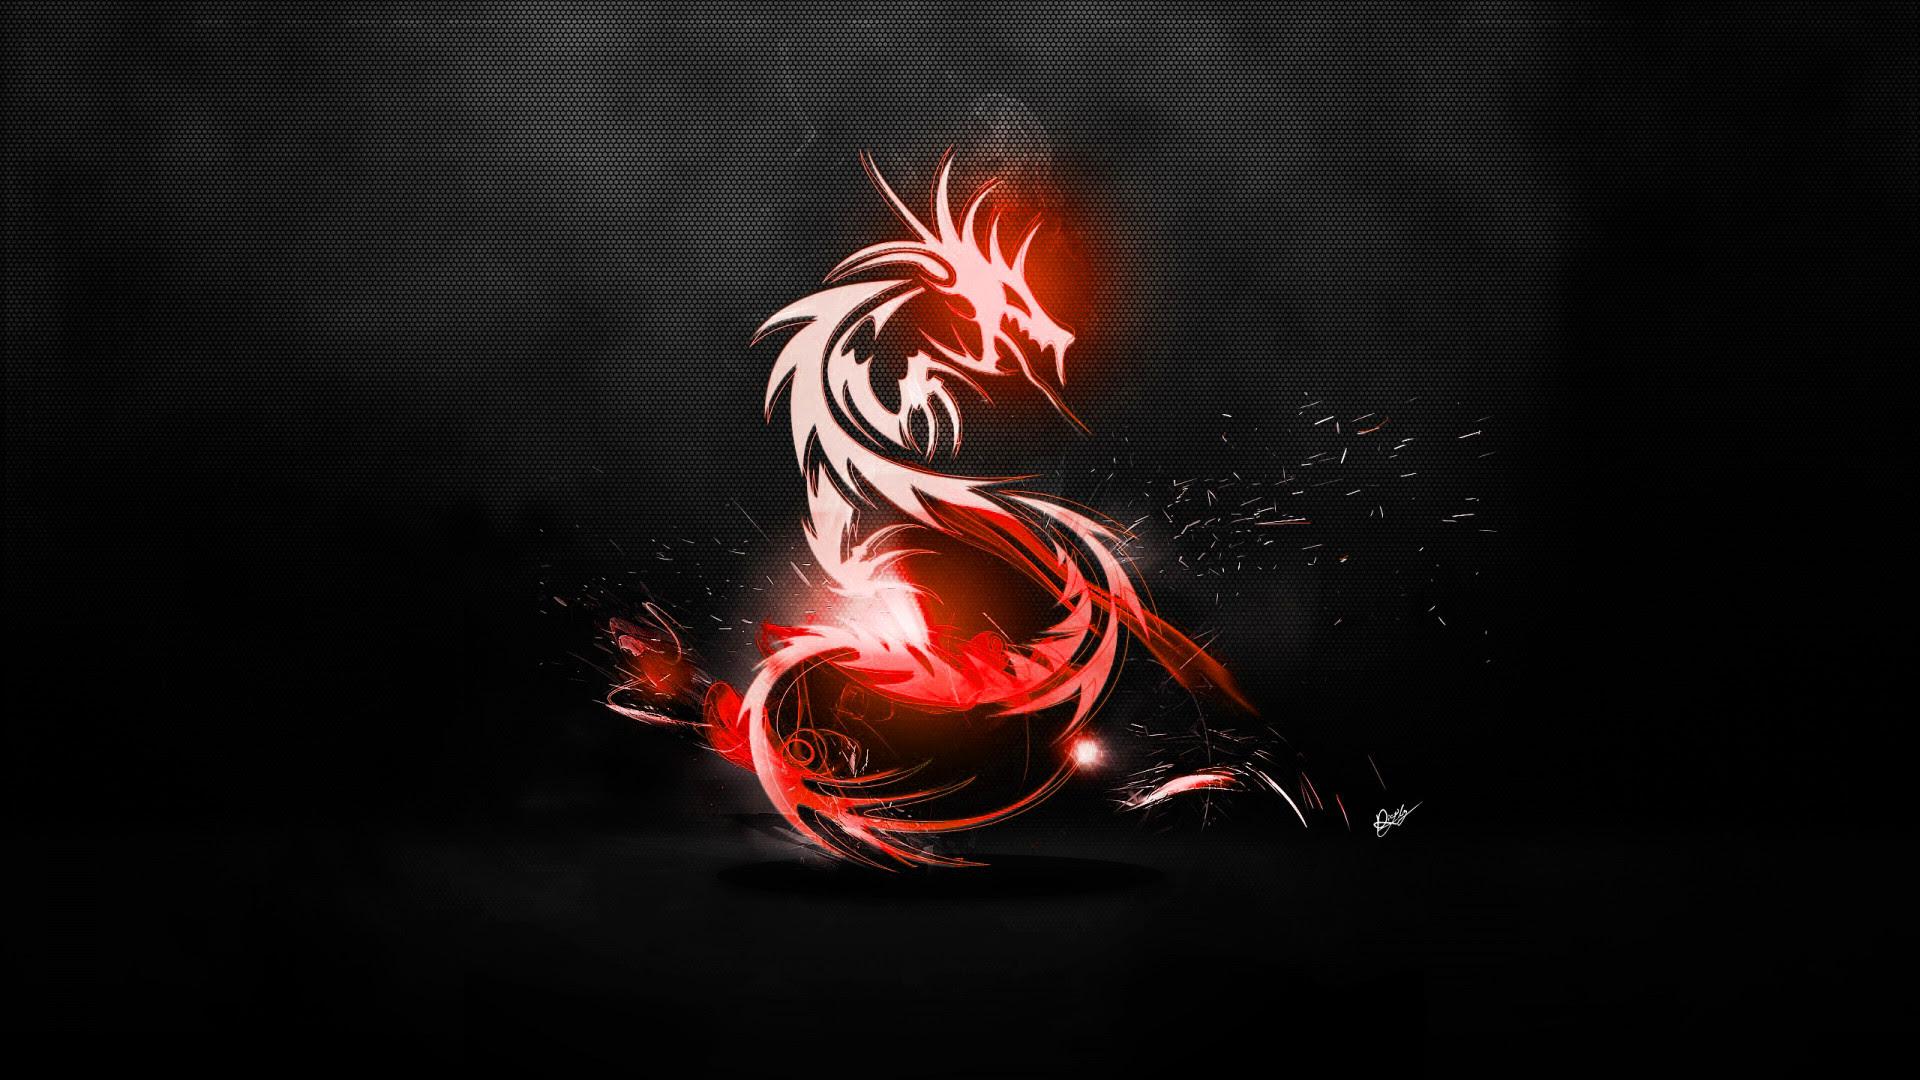 Download 80 Wallpaper Black Dragon HD Paling Keren